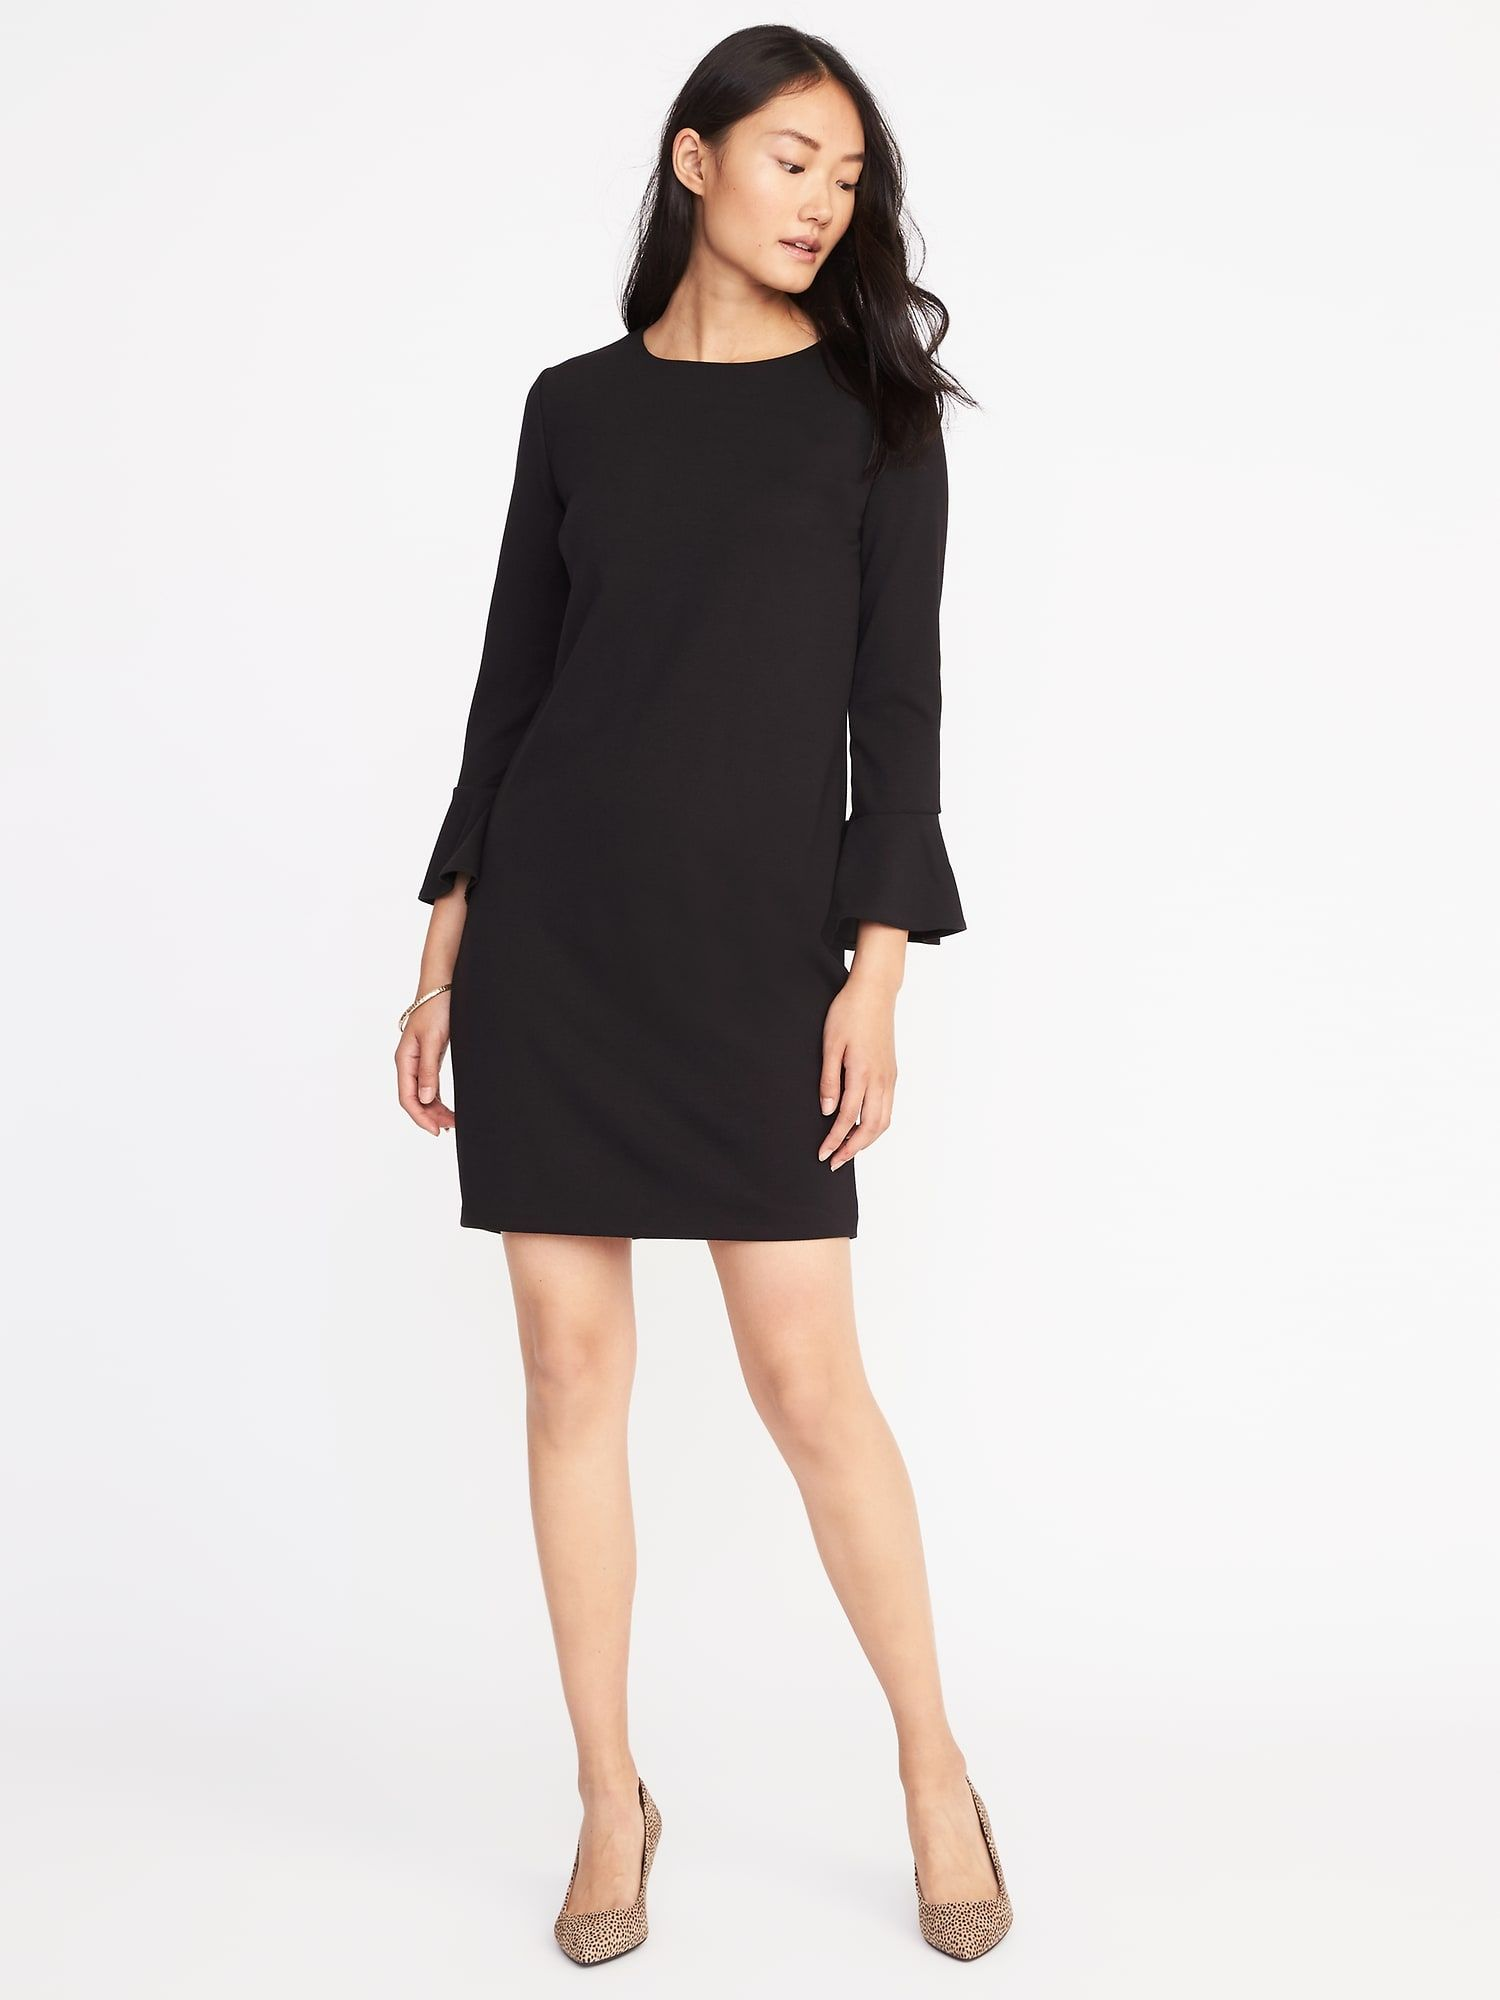 636524bed7650b Ponte-Knit Flute-Sleeve Shift Dress for Women